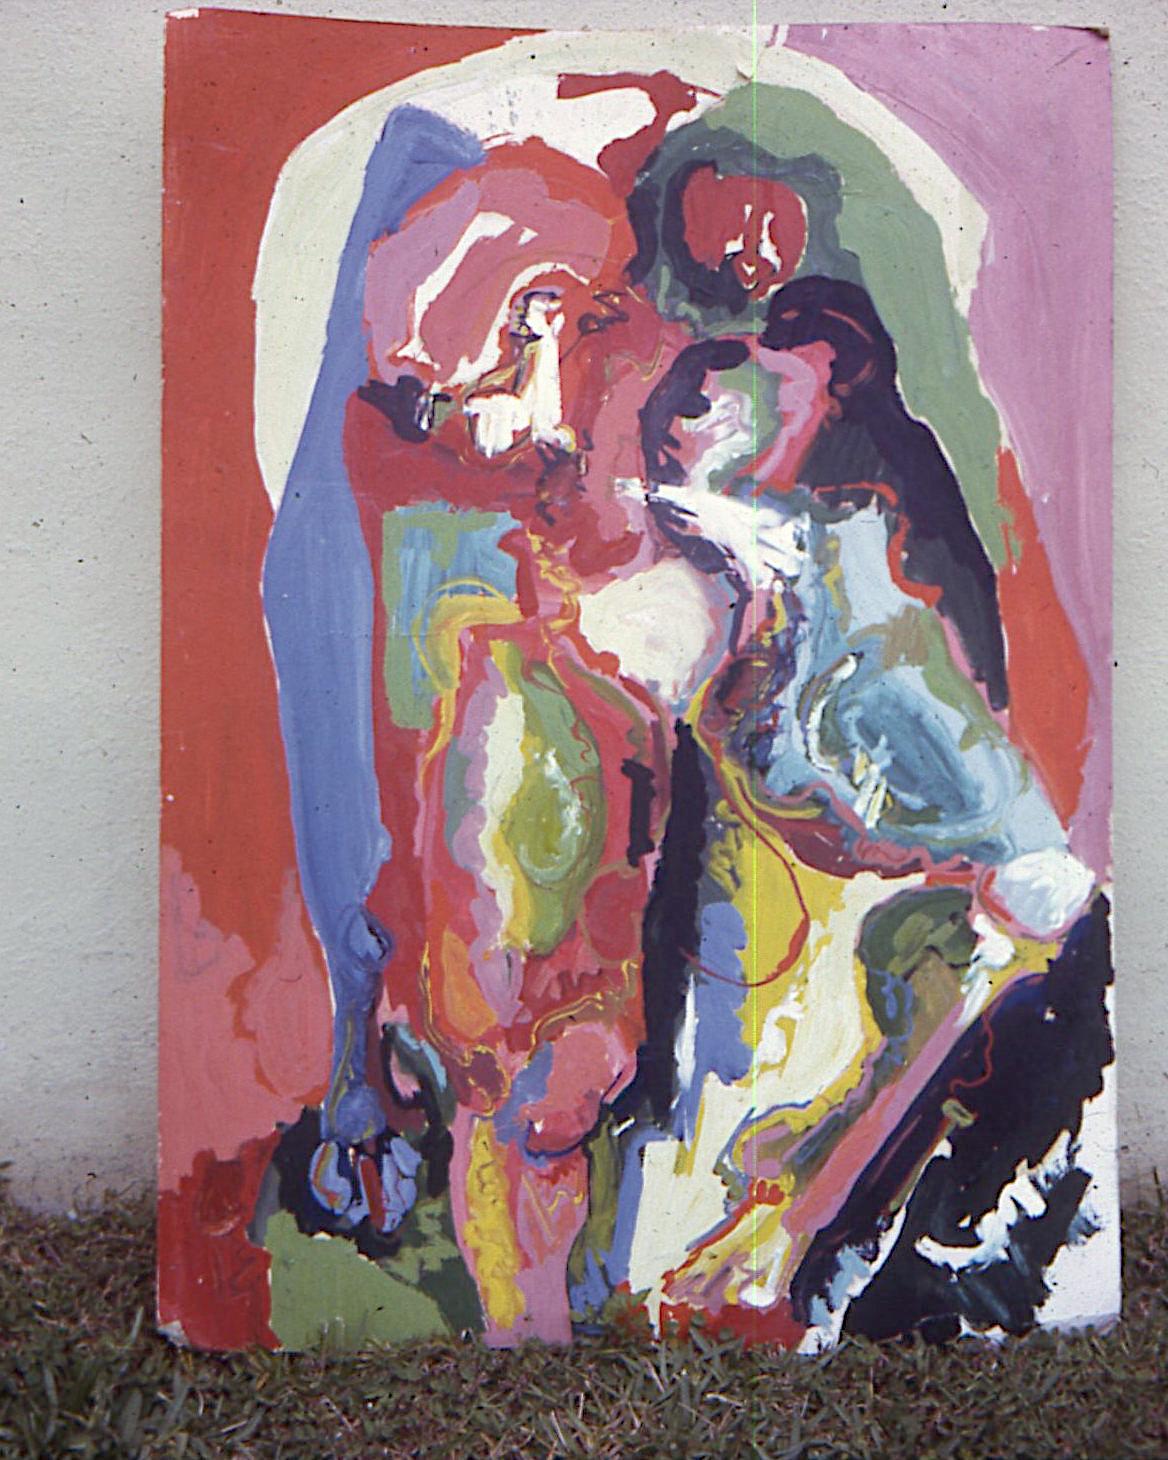 Bonnie Louie?, 1971. oil on canvas